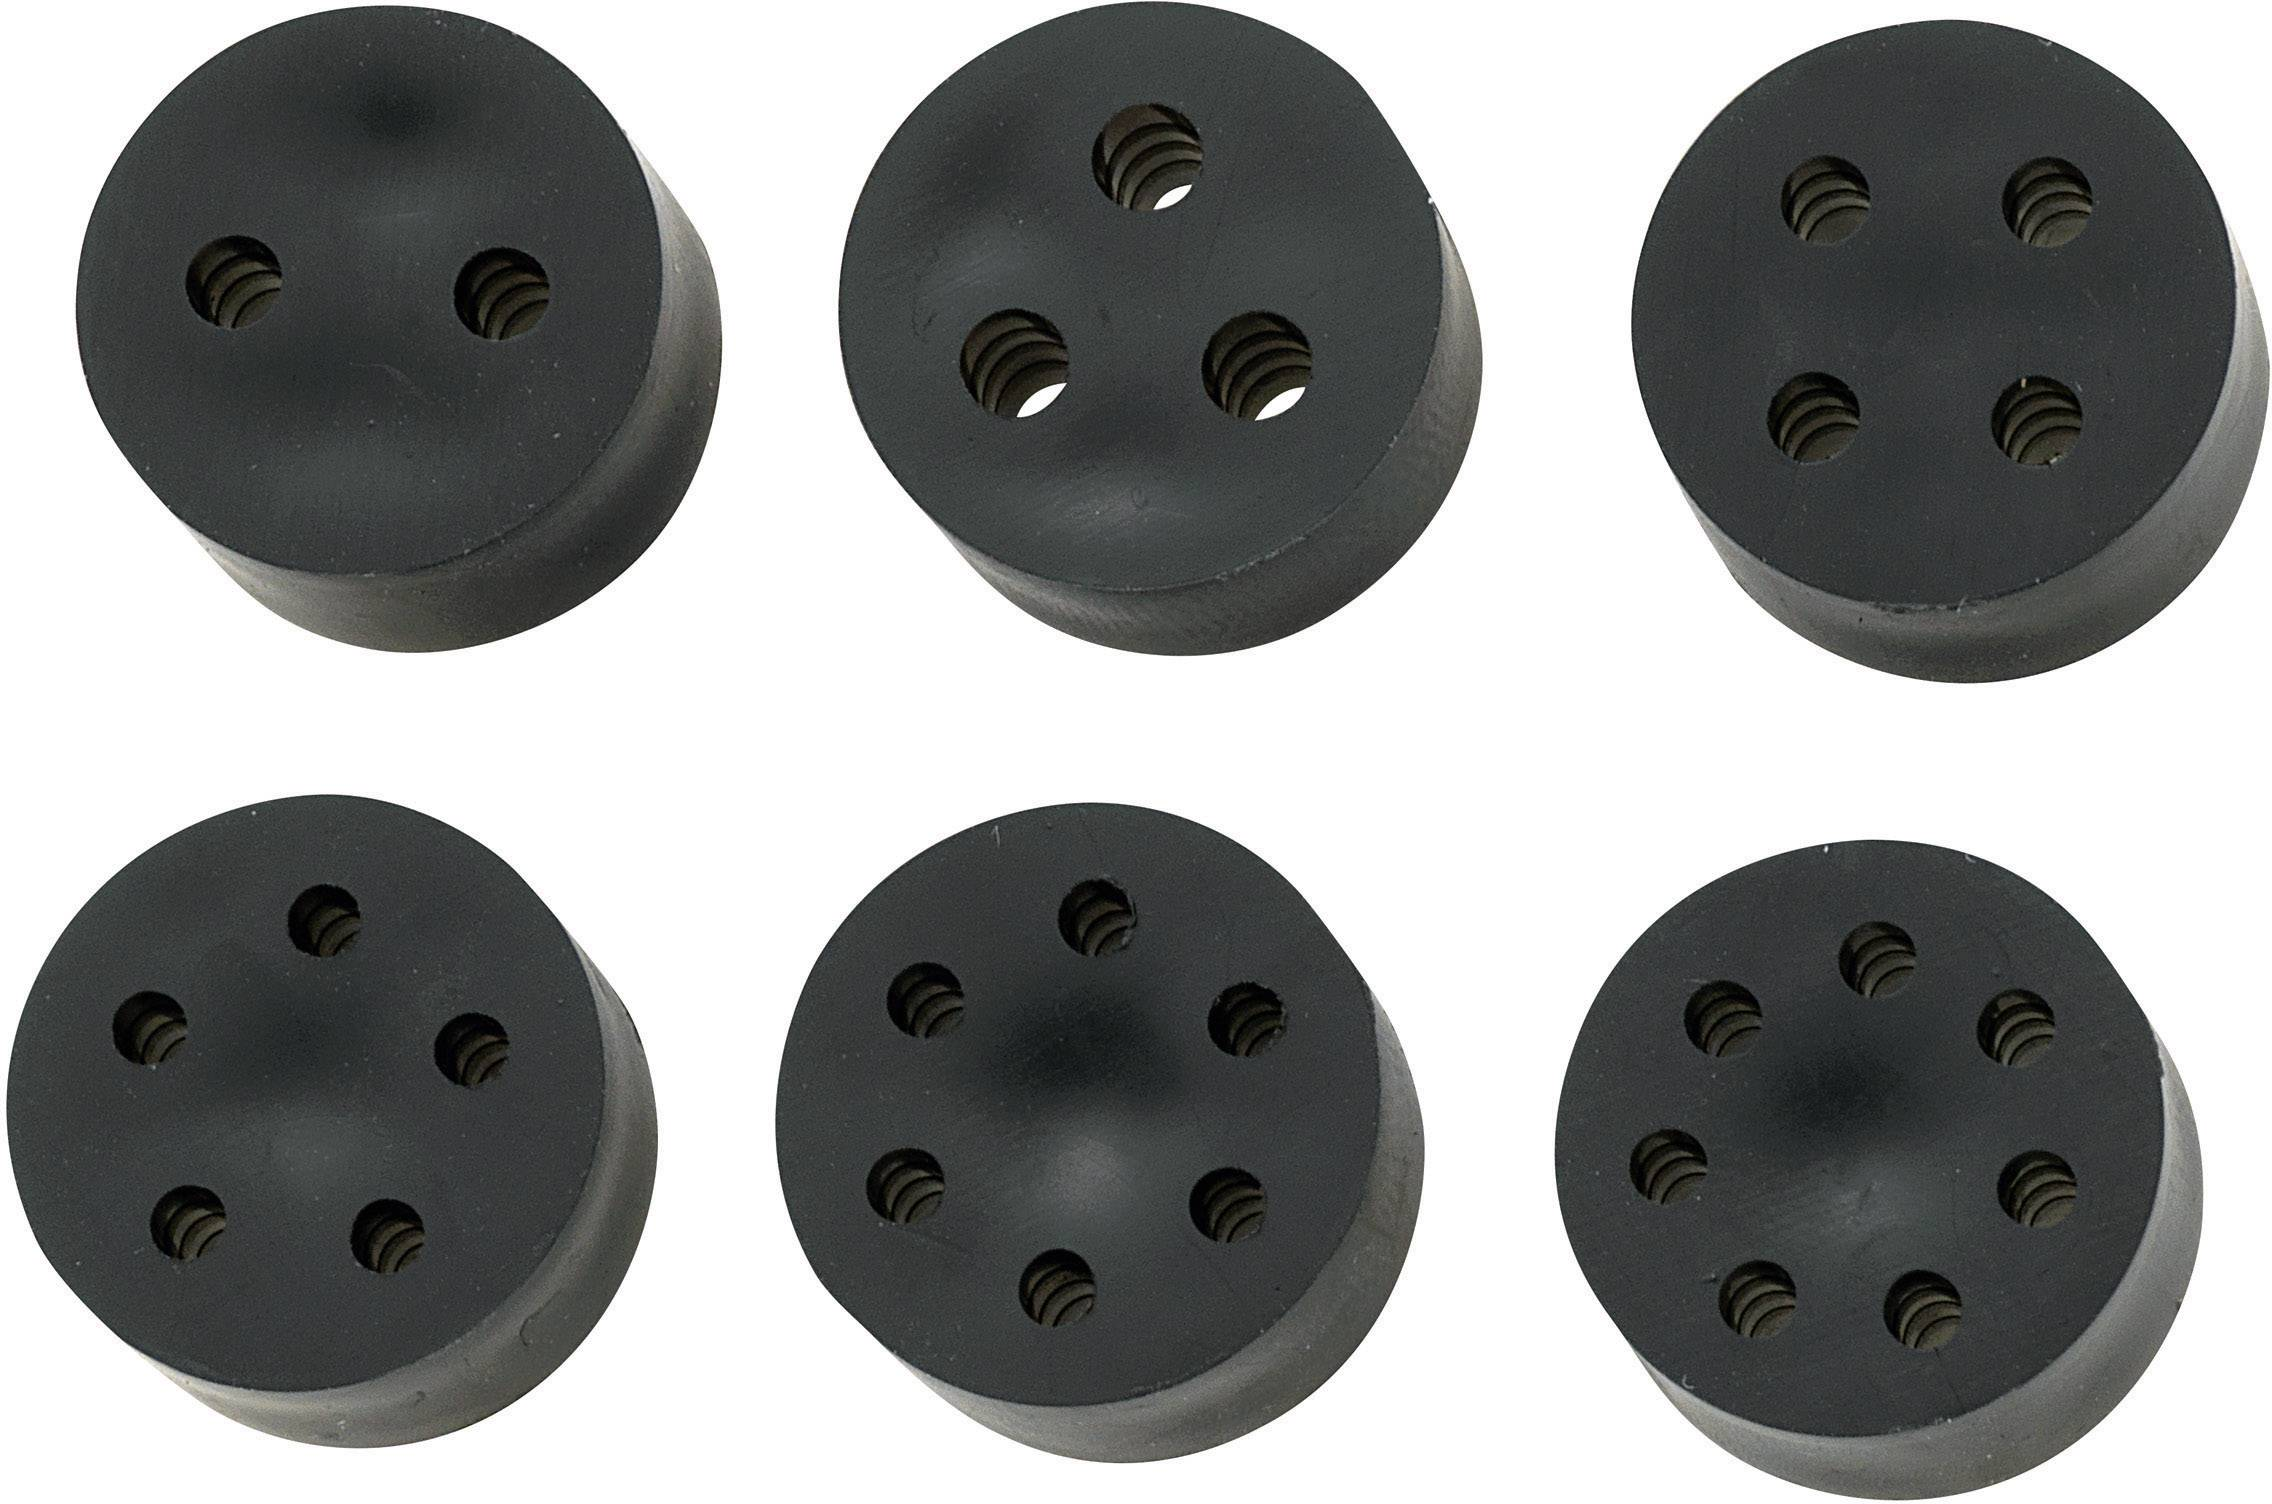 Těsnicí vložka M40 KSS AGRS402B (MH39-2B), IP68, M40, guma, černá